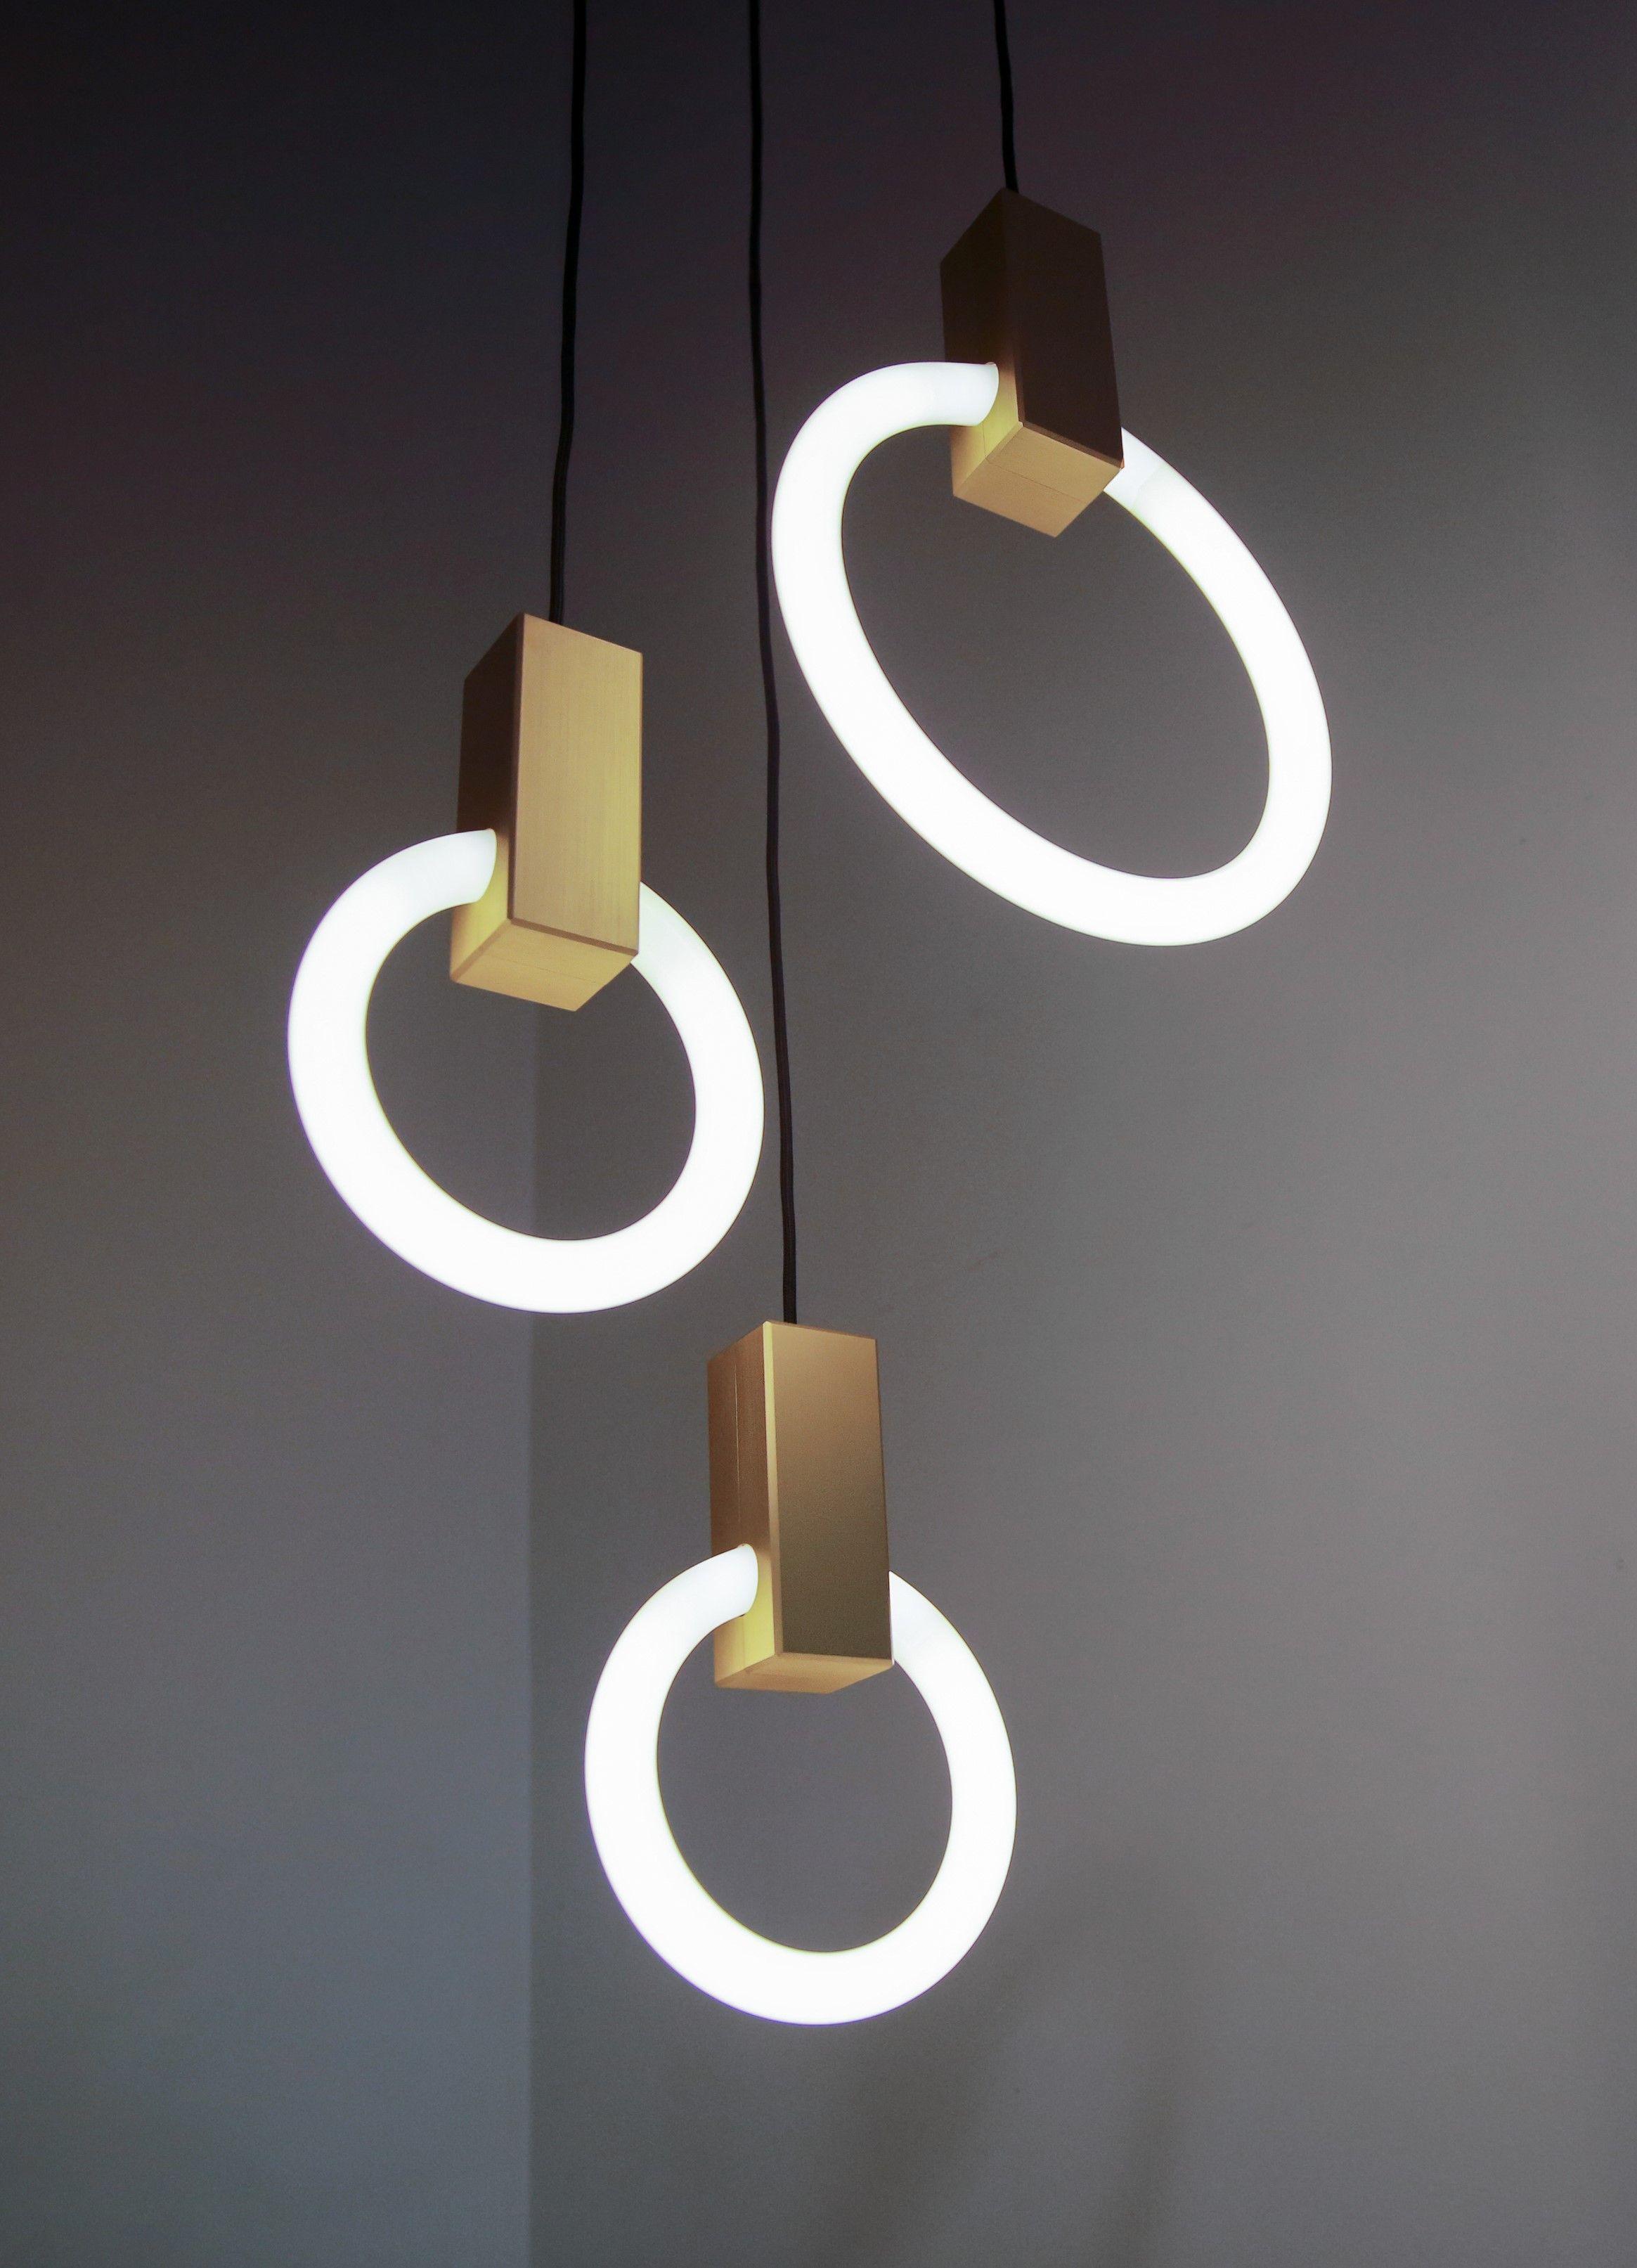 Halo Pendant By Matthew Mccormick Ha150810 Modern Lighting Design Lamp Lamp Design